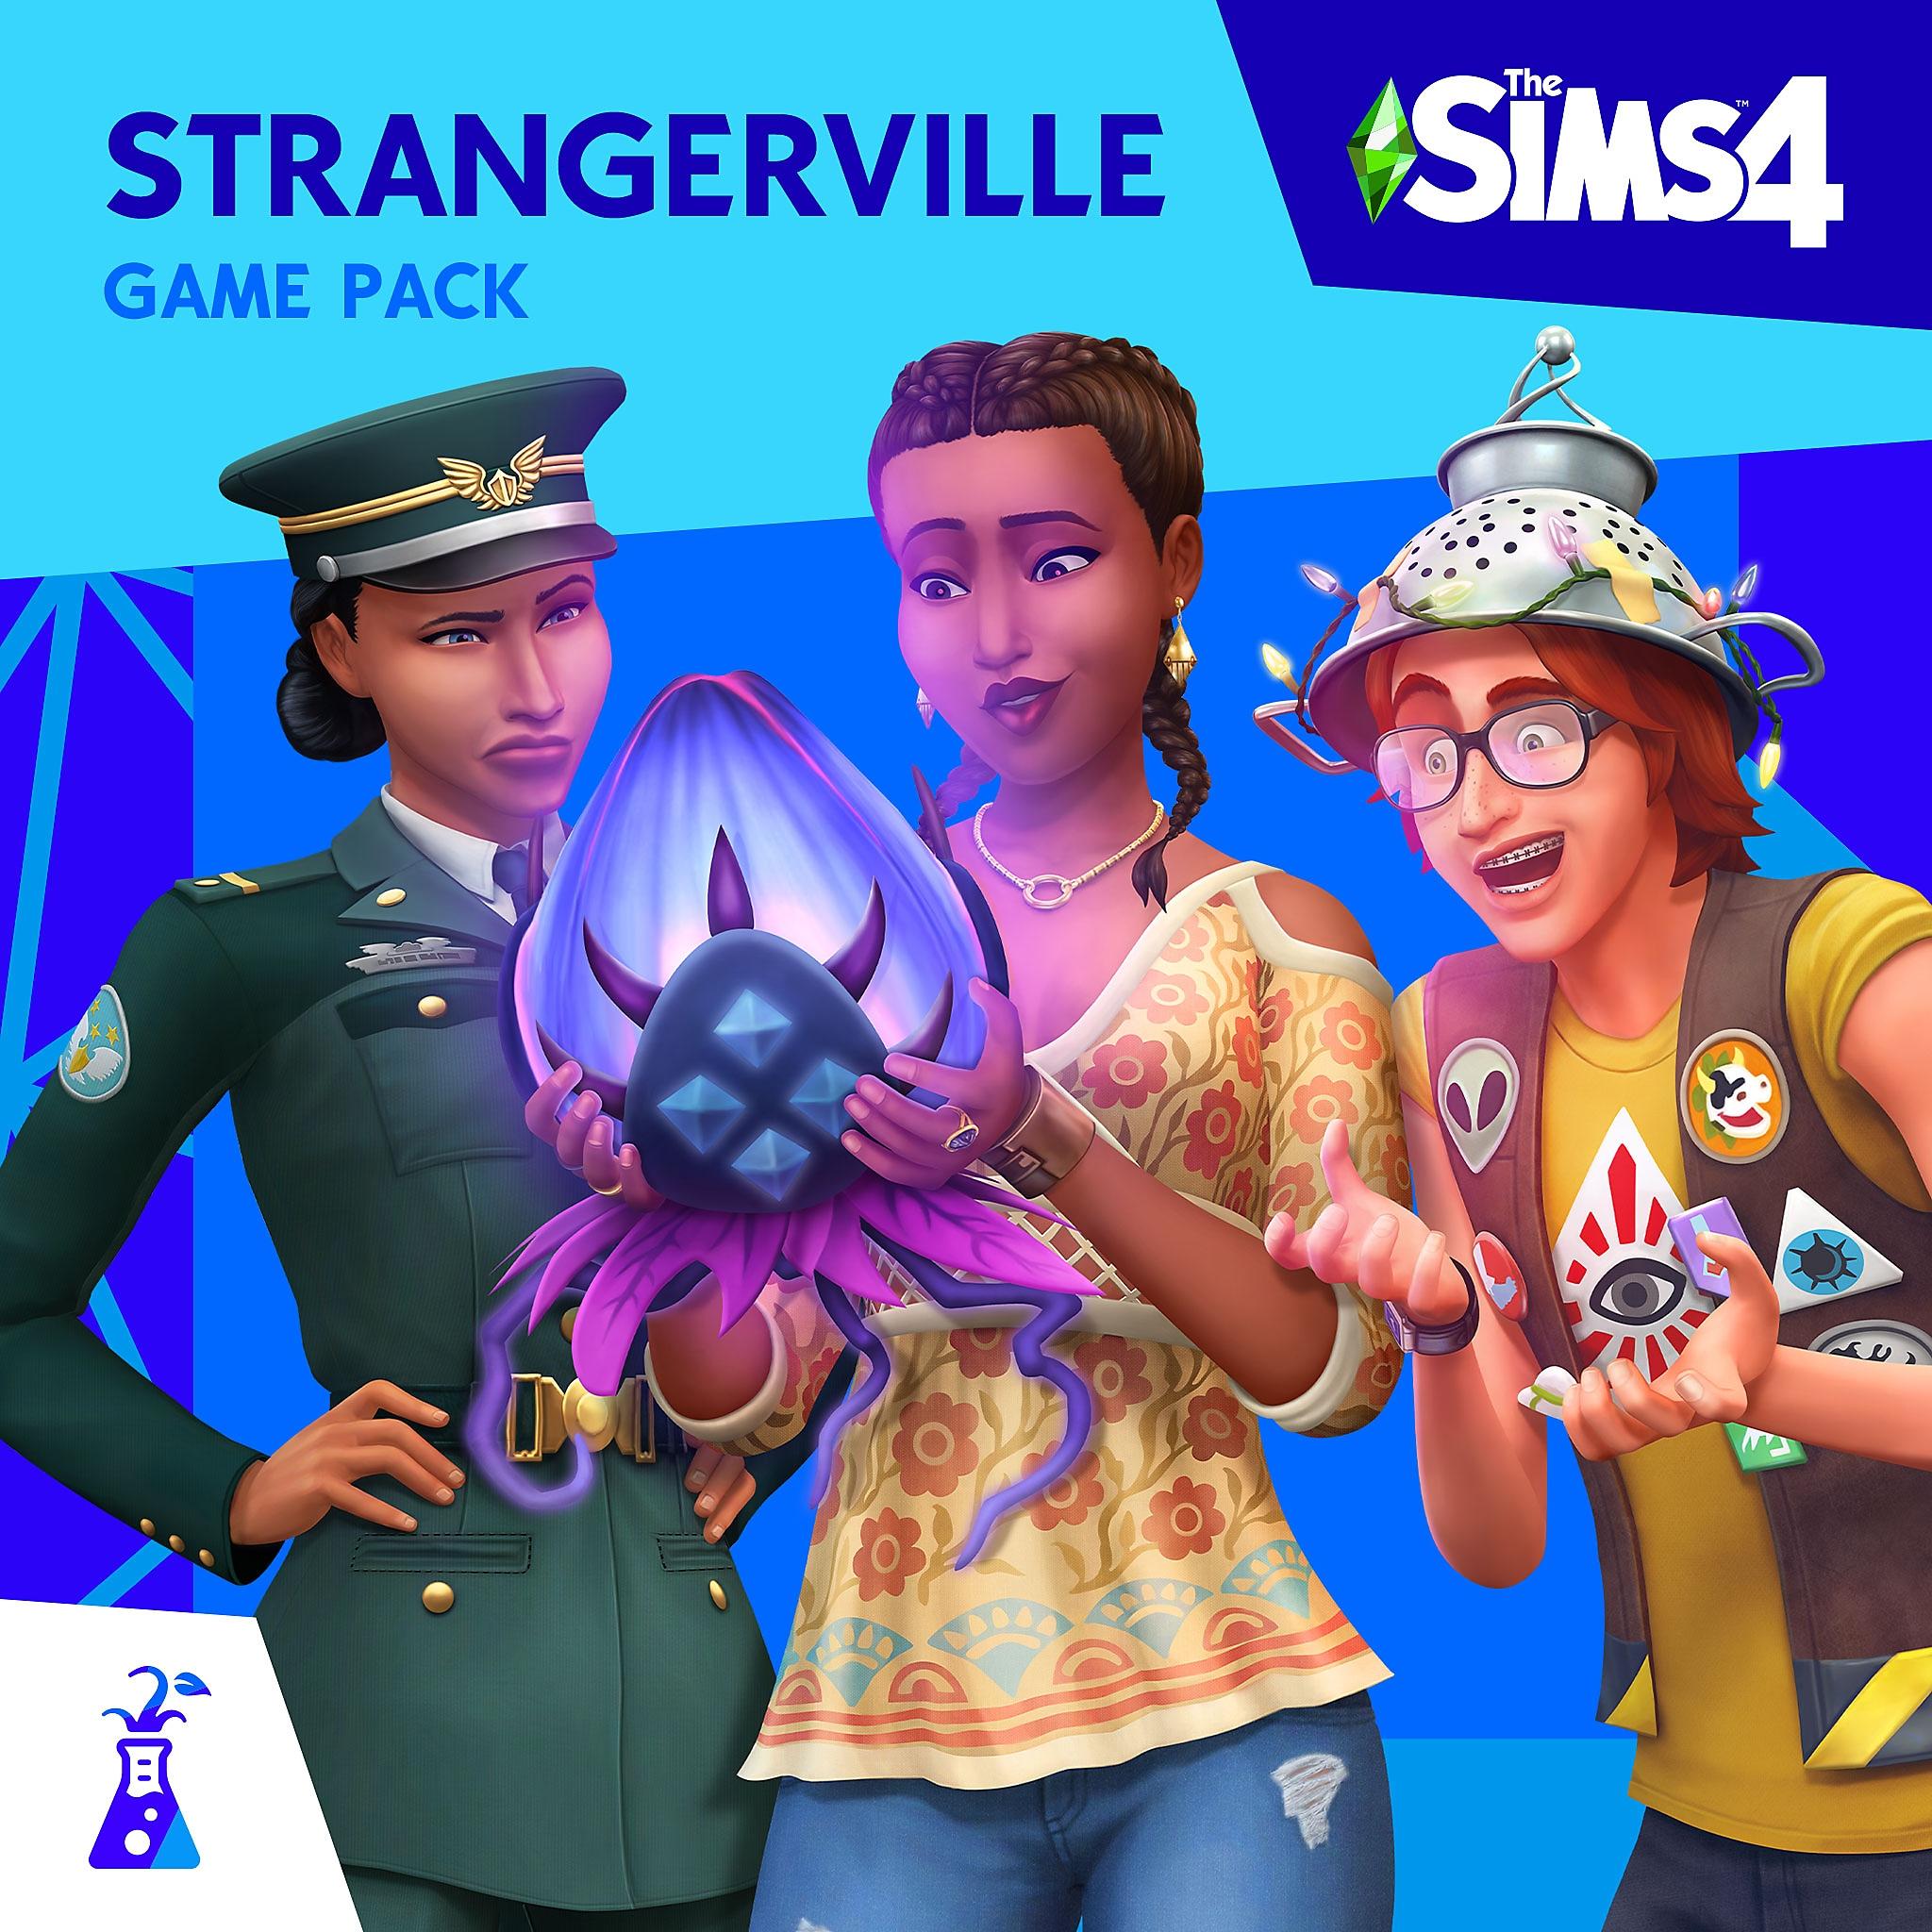 Strangerville Game Pack